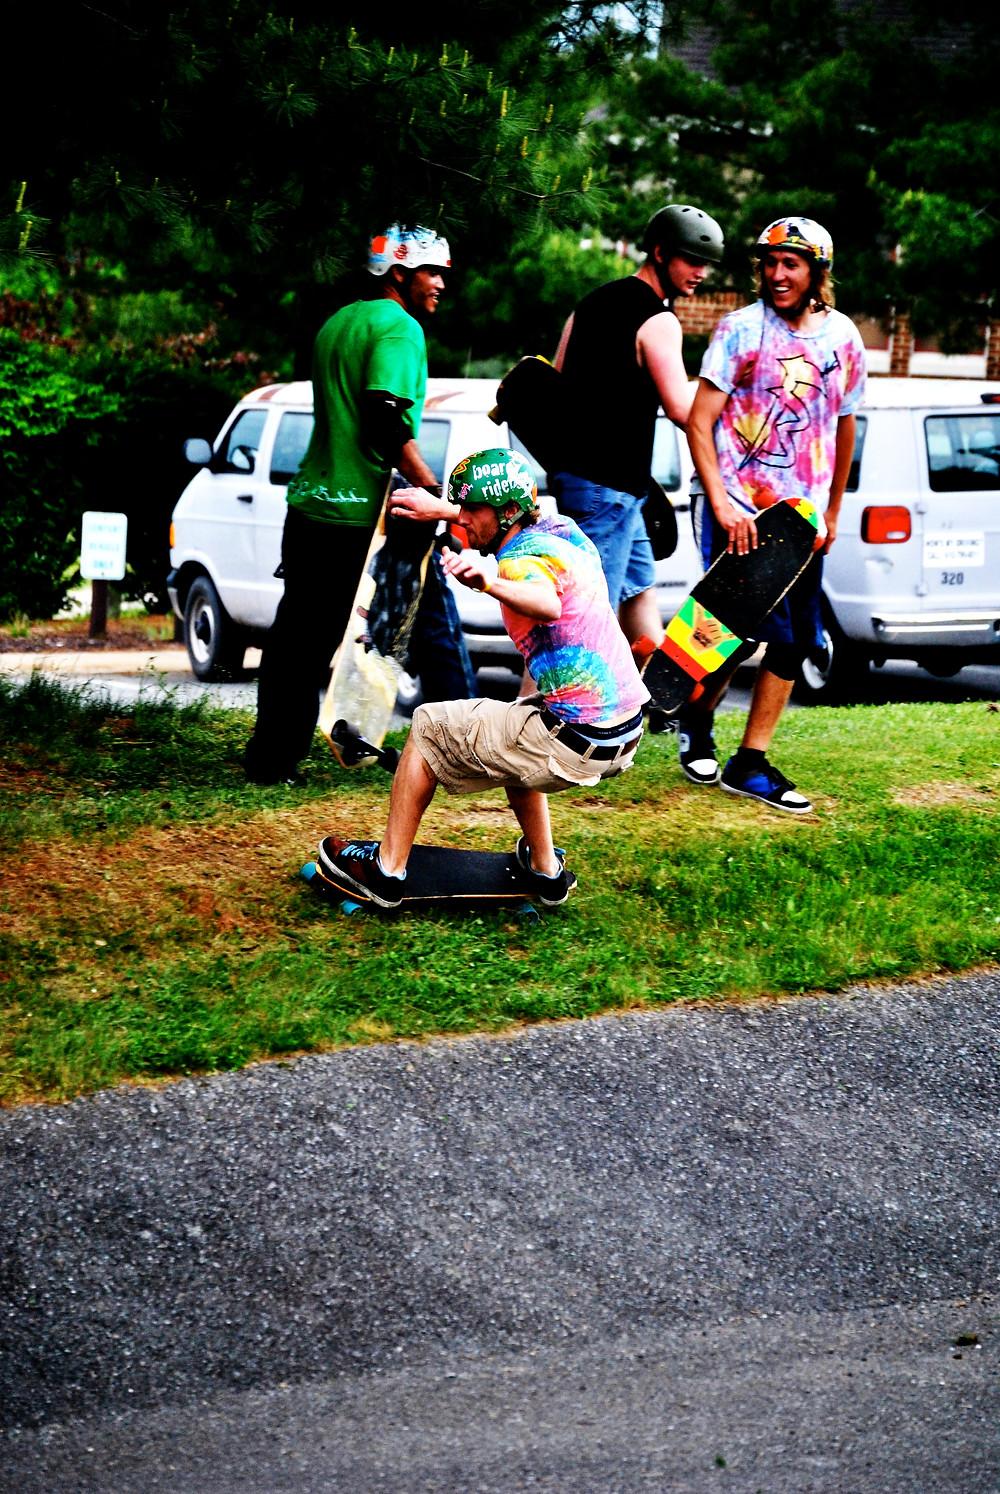 brian grass riding.JPG